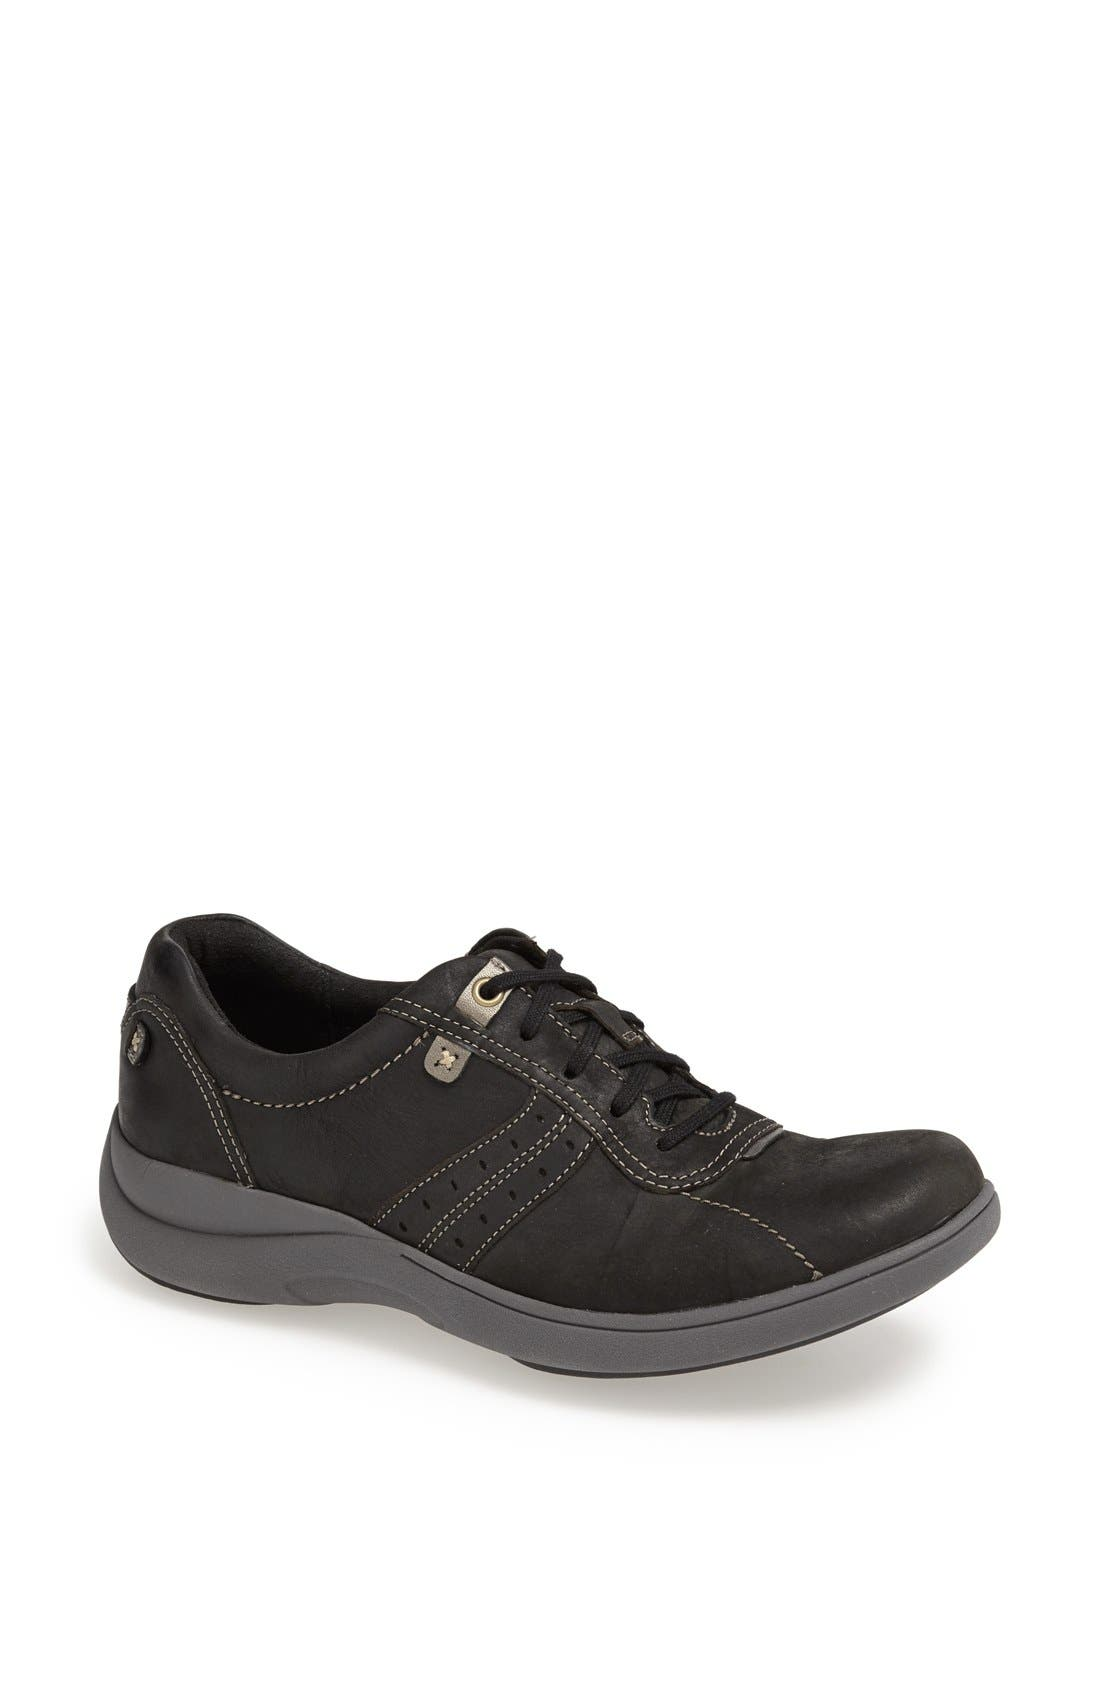 Alternate Image 1 Selected - Aravon 'REVsmart' Sneaker (Women)